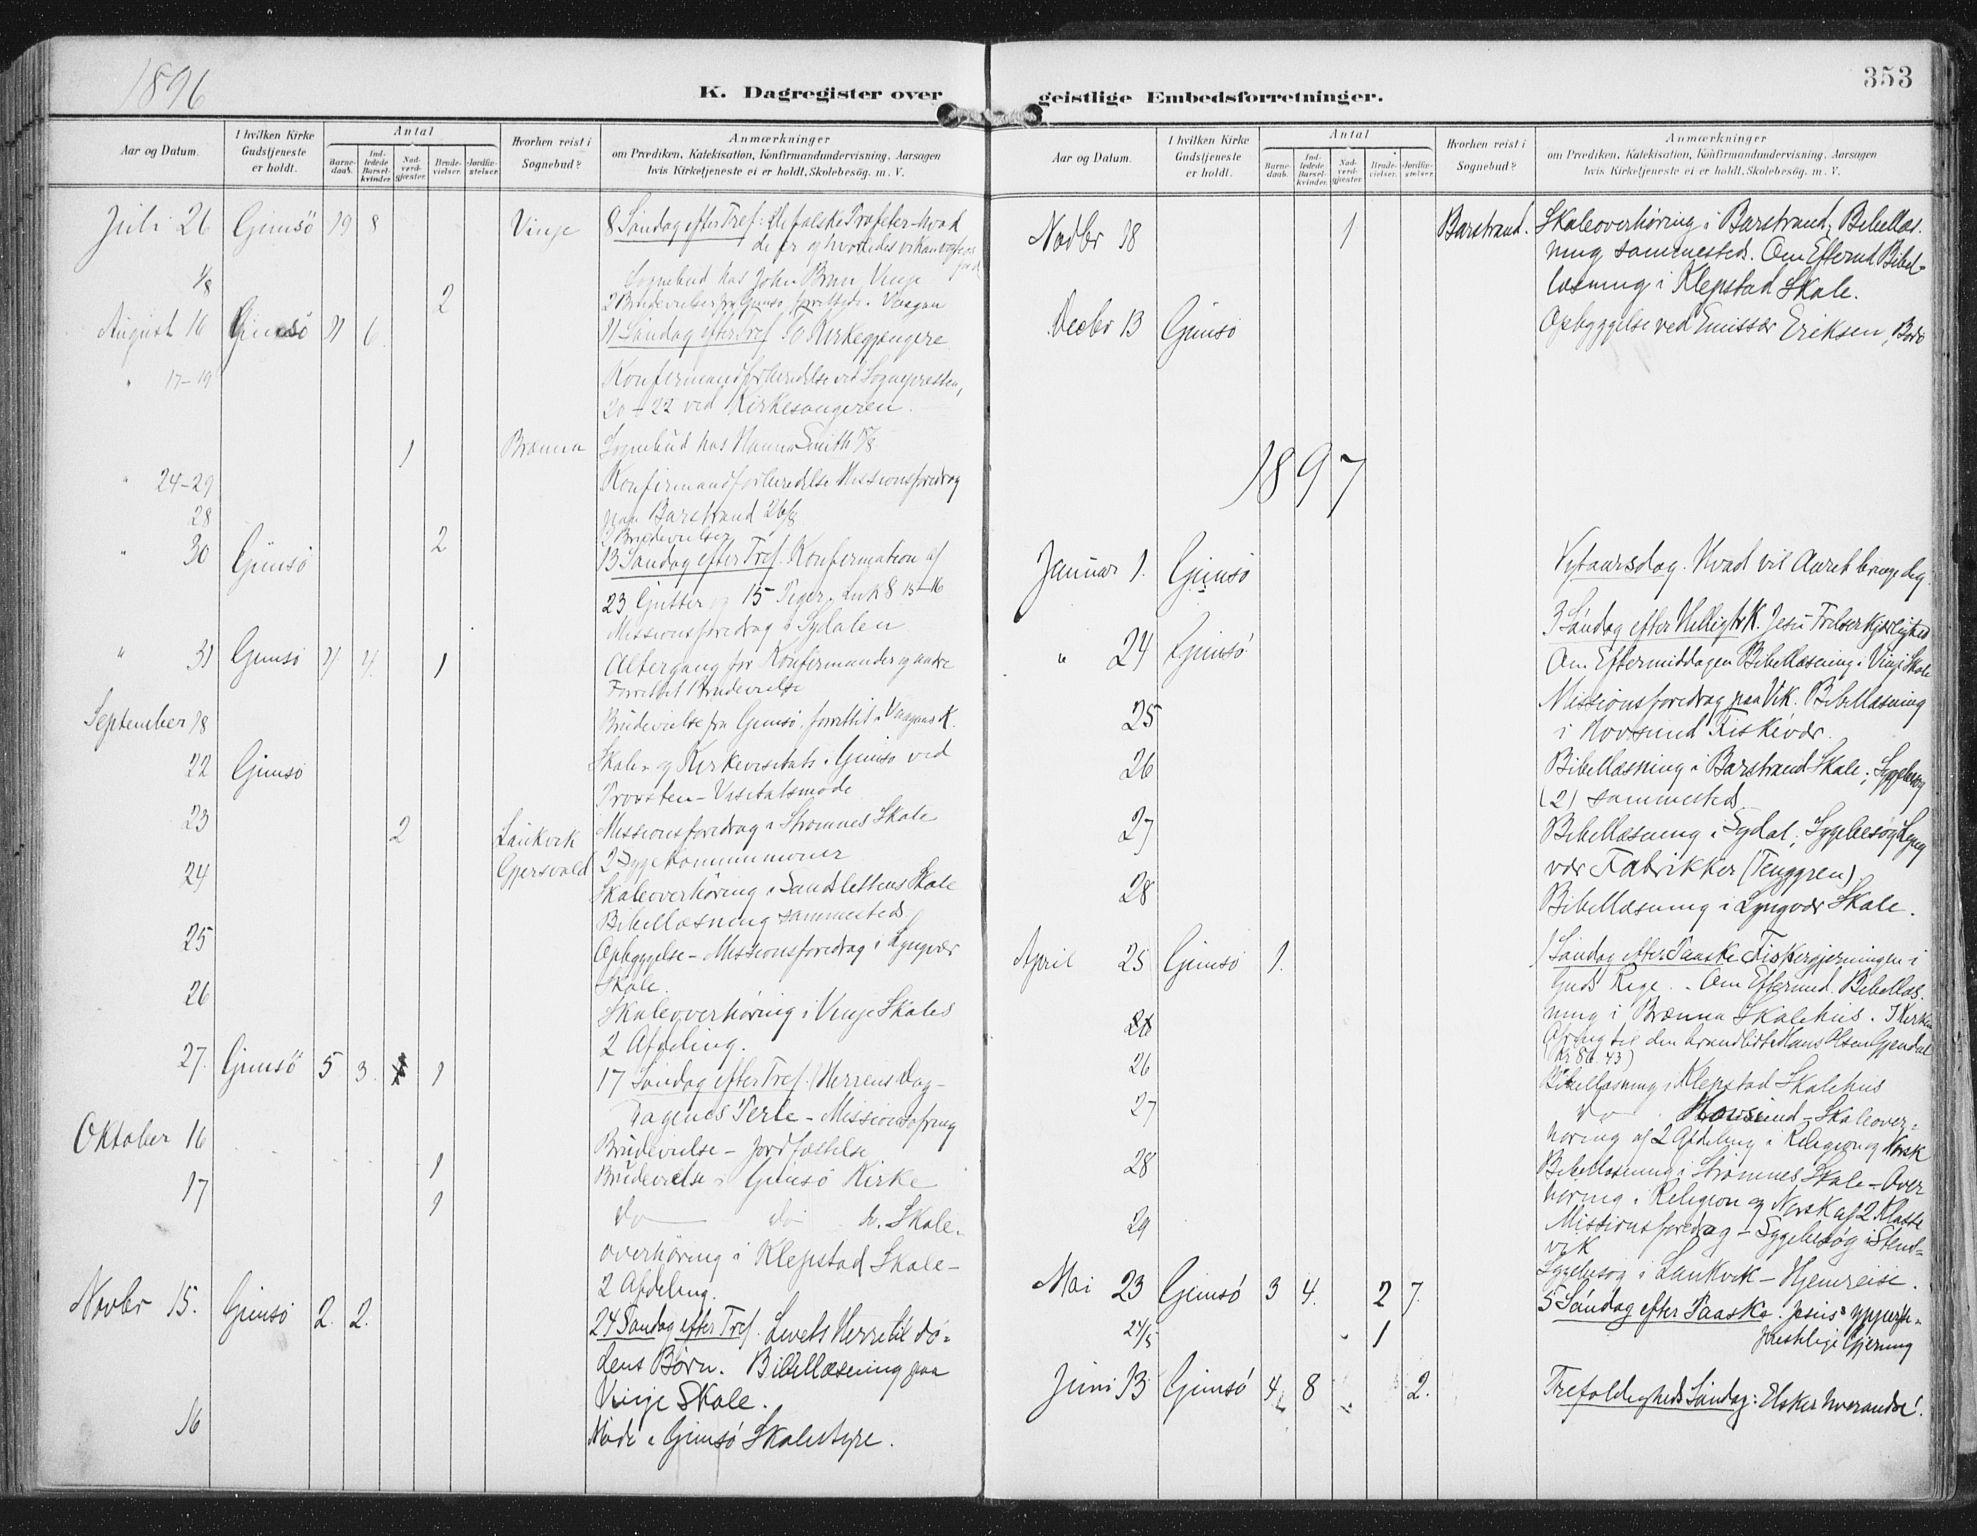 SAT, Ministerialprotokoller, klokkerbøker og fødselsregistre - Nordland, 876/L1098: Ministerialbok nr. 876A04, 1896-1915, s. 353